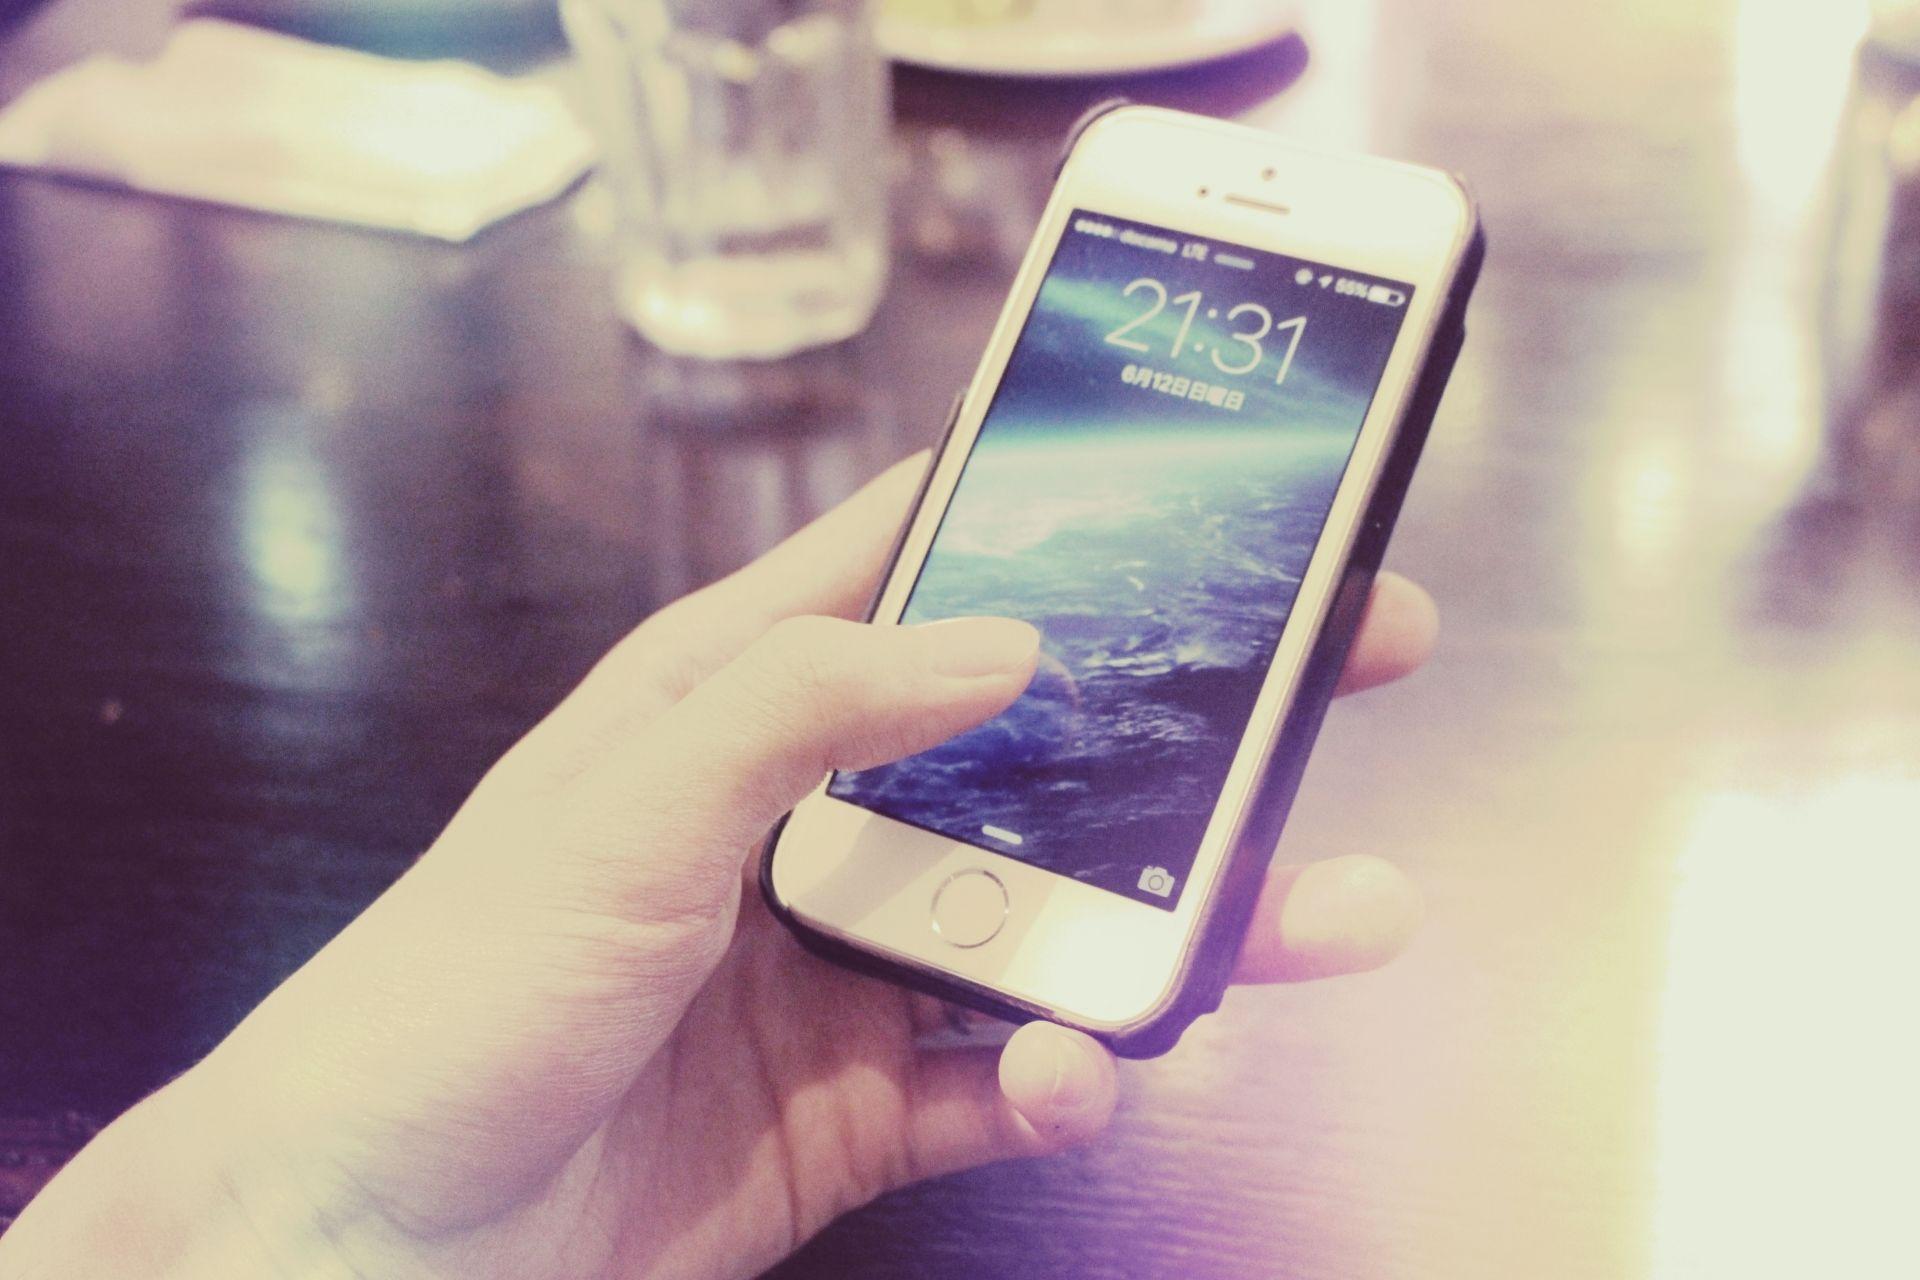 iPhoneSE2発売目前!今「買って良い機種・ダメな機種」